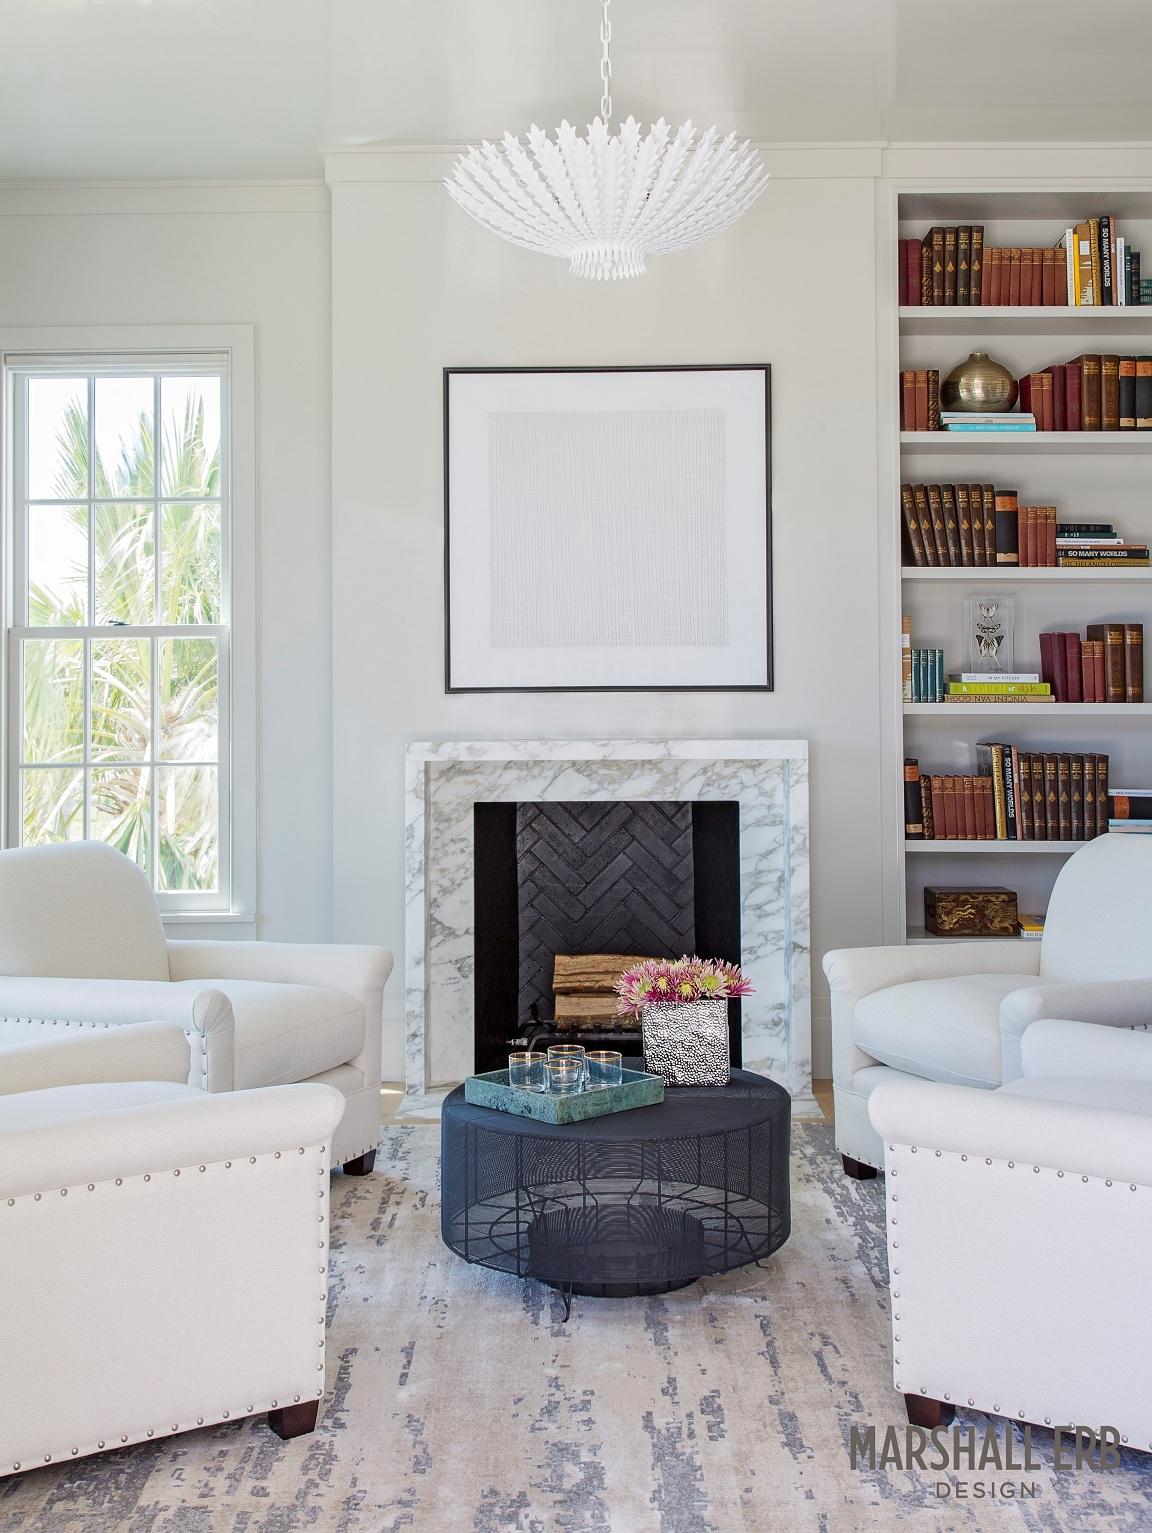 Marshall-Erb-Design-Beach-House-Living